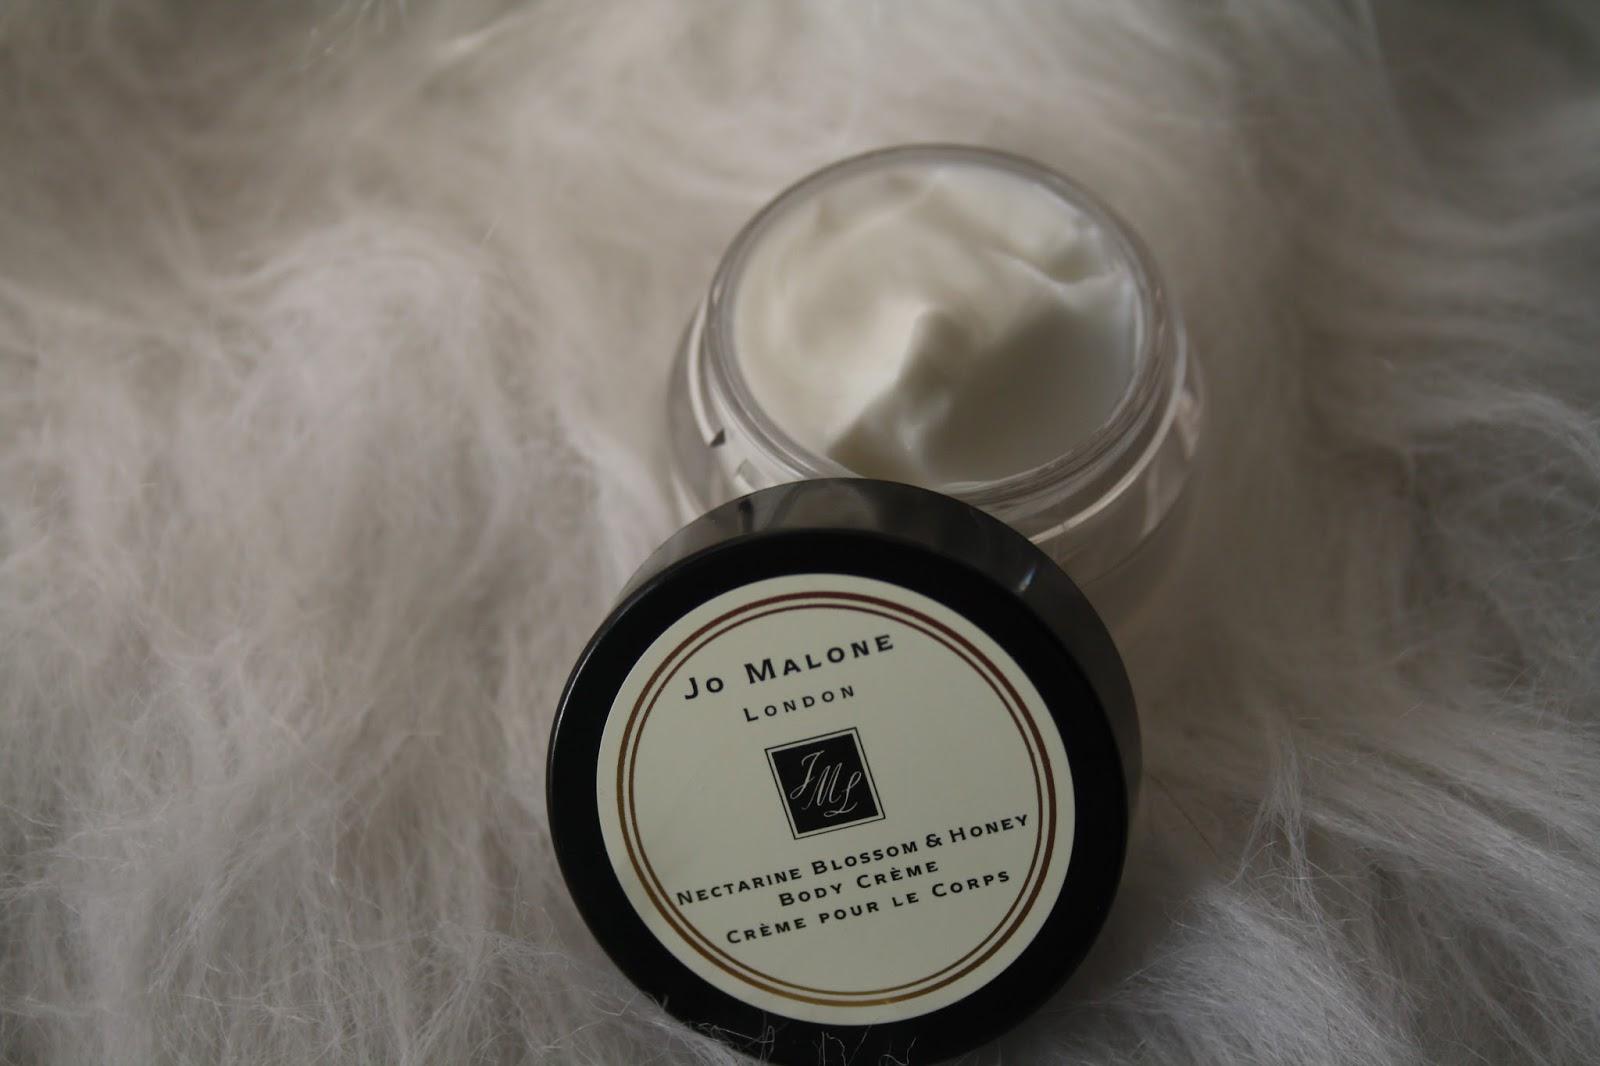 Jo Malone Nectarine Blossom & Honey Body Cream